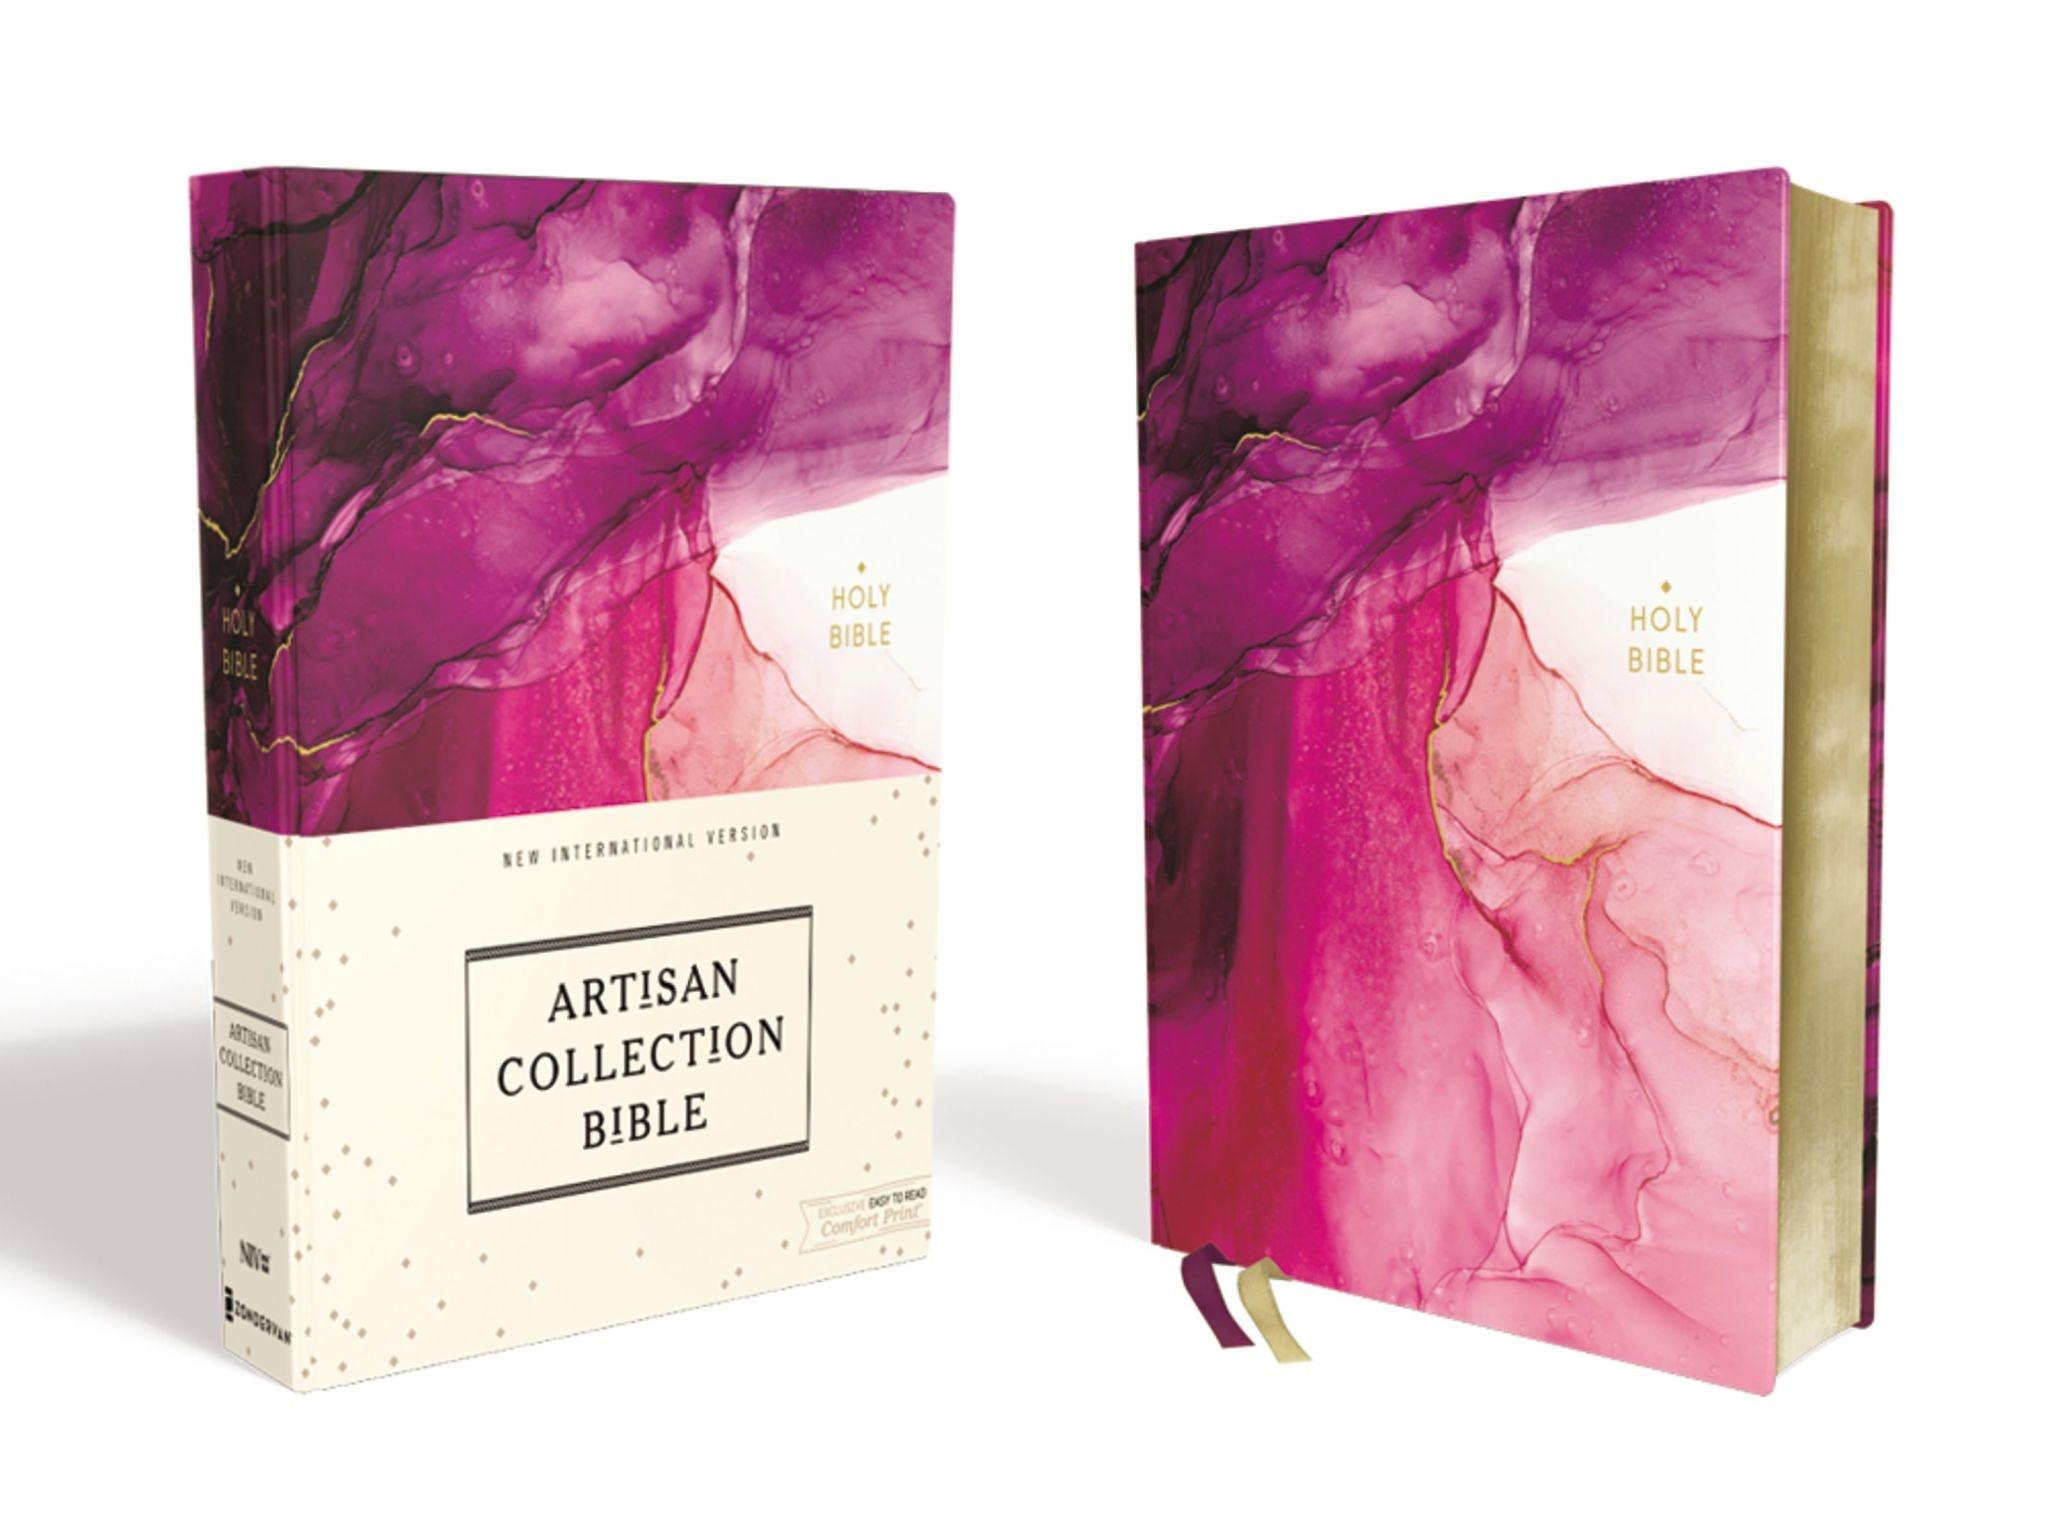 NIV Artisan Collection Bible - Pink